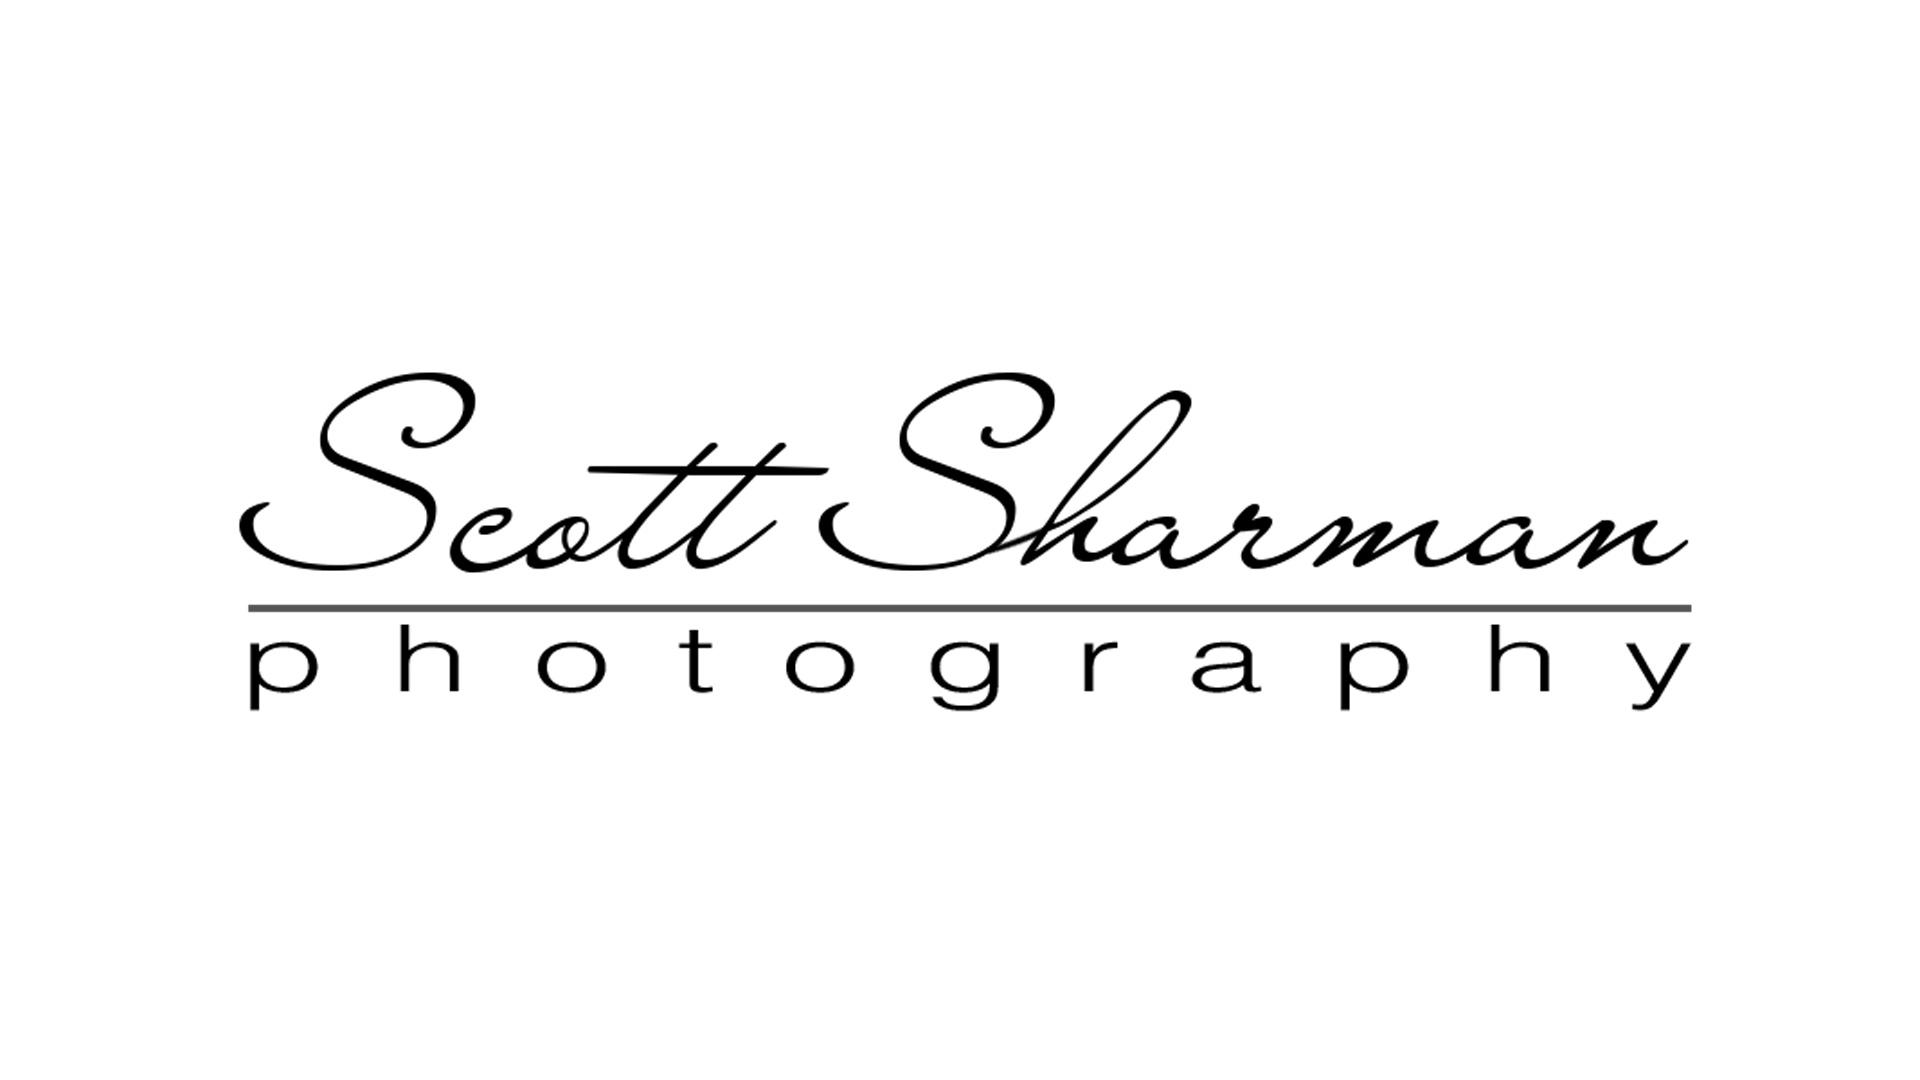 Scott Sharman Photography